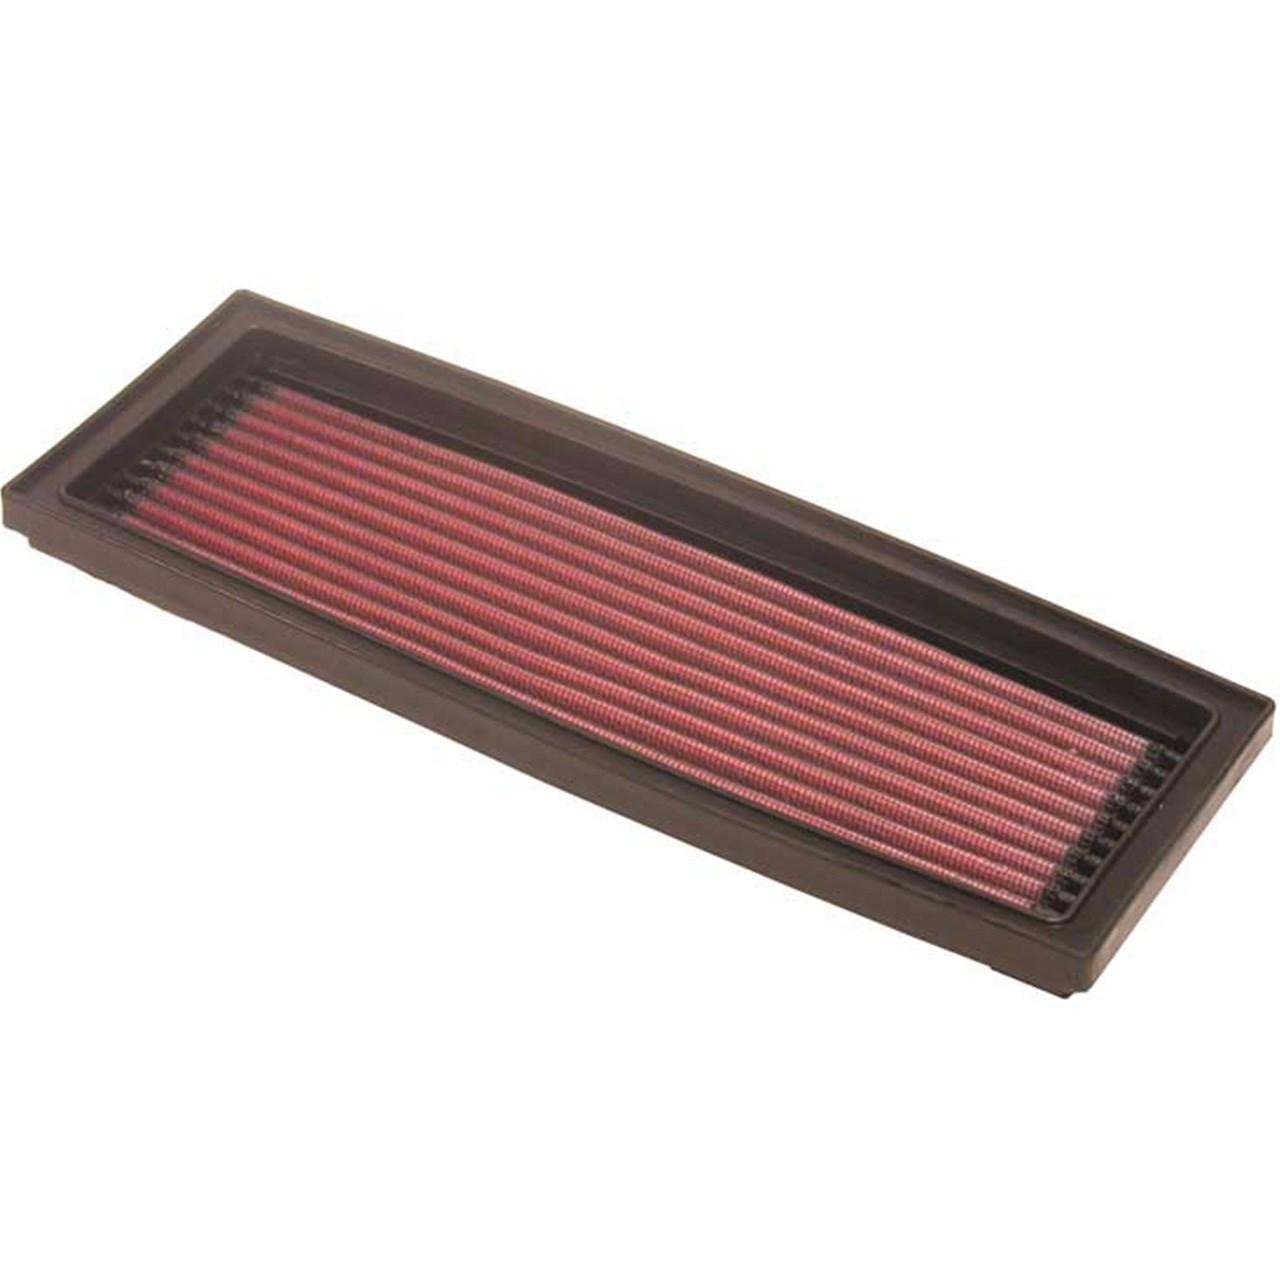 فیلتر هوای خودروی کی اند ان مدل 2673-33